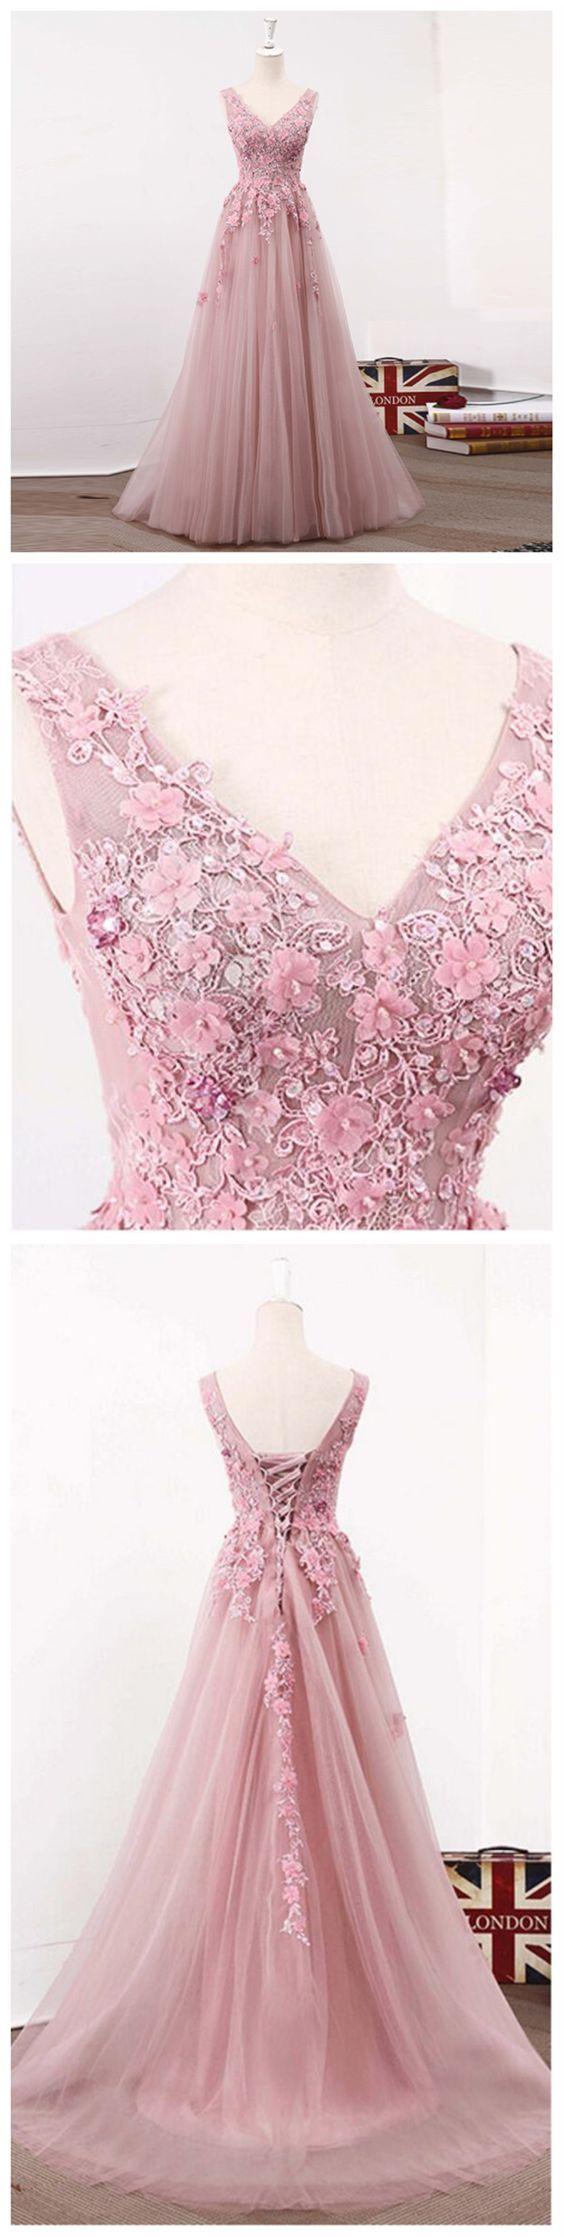 9 best Mermaid Lace Dress images on Pinterest